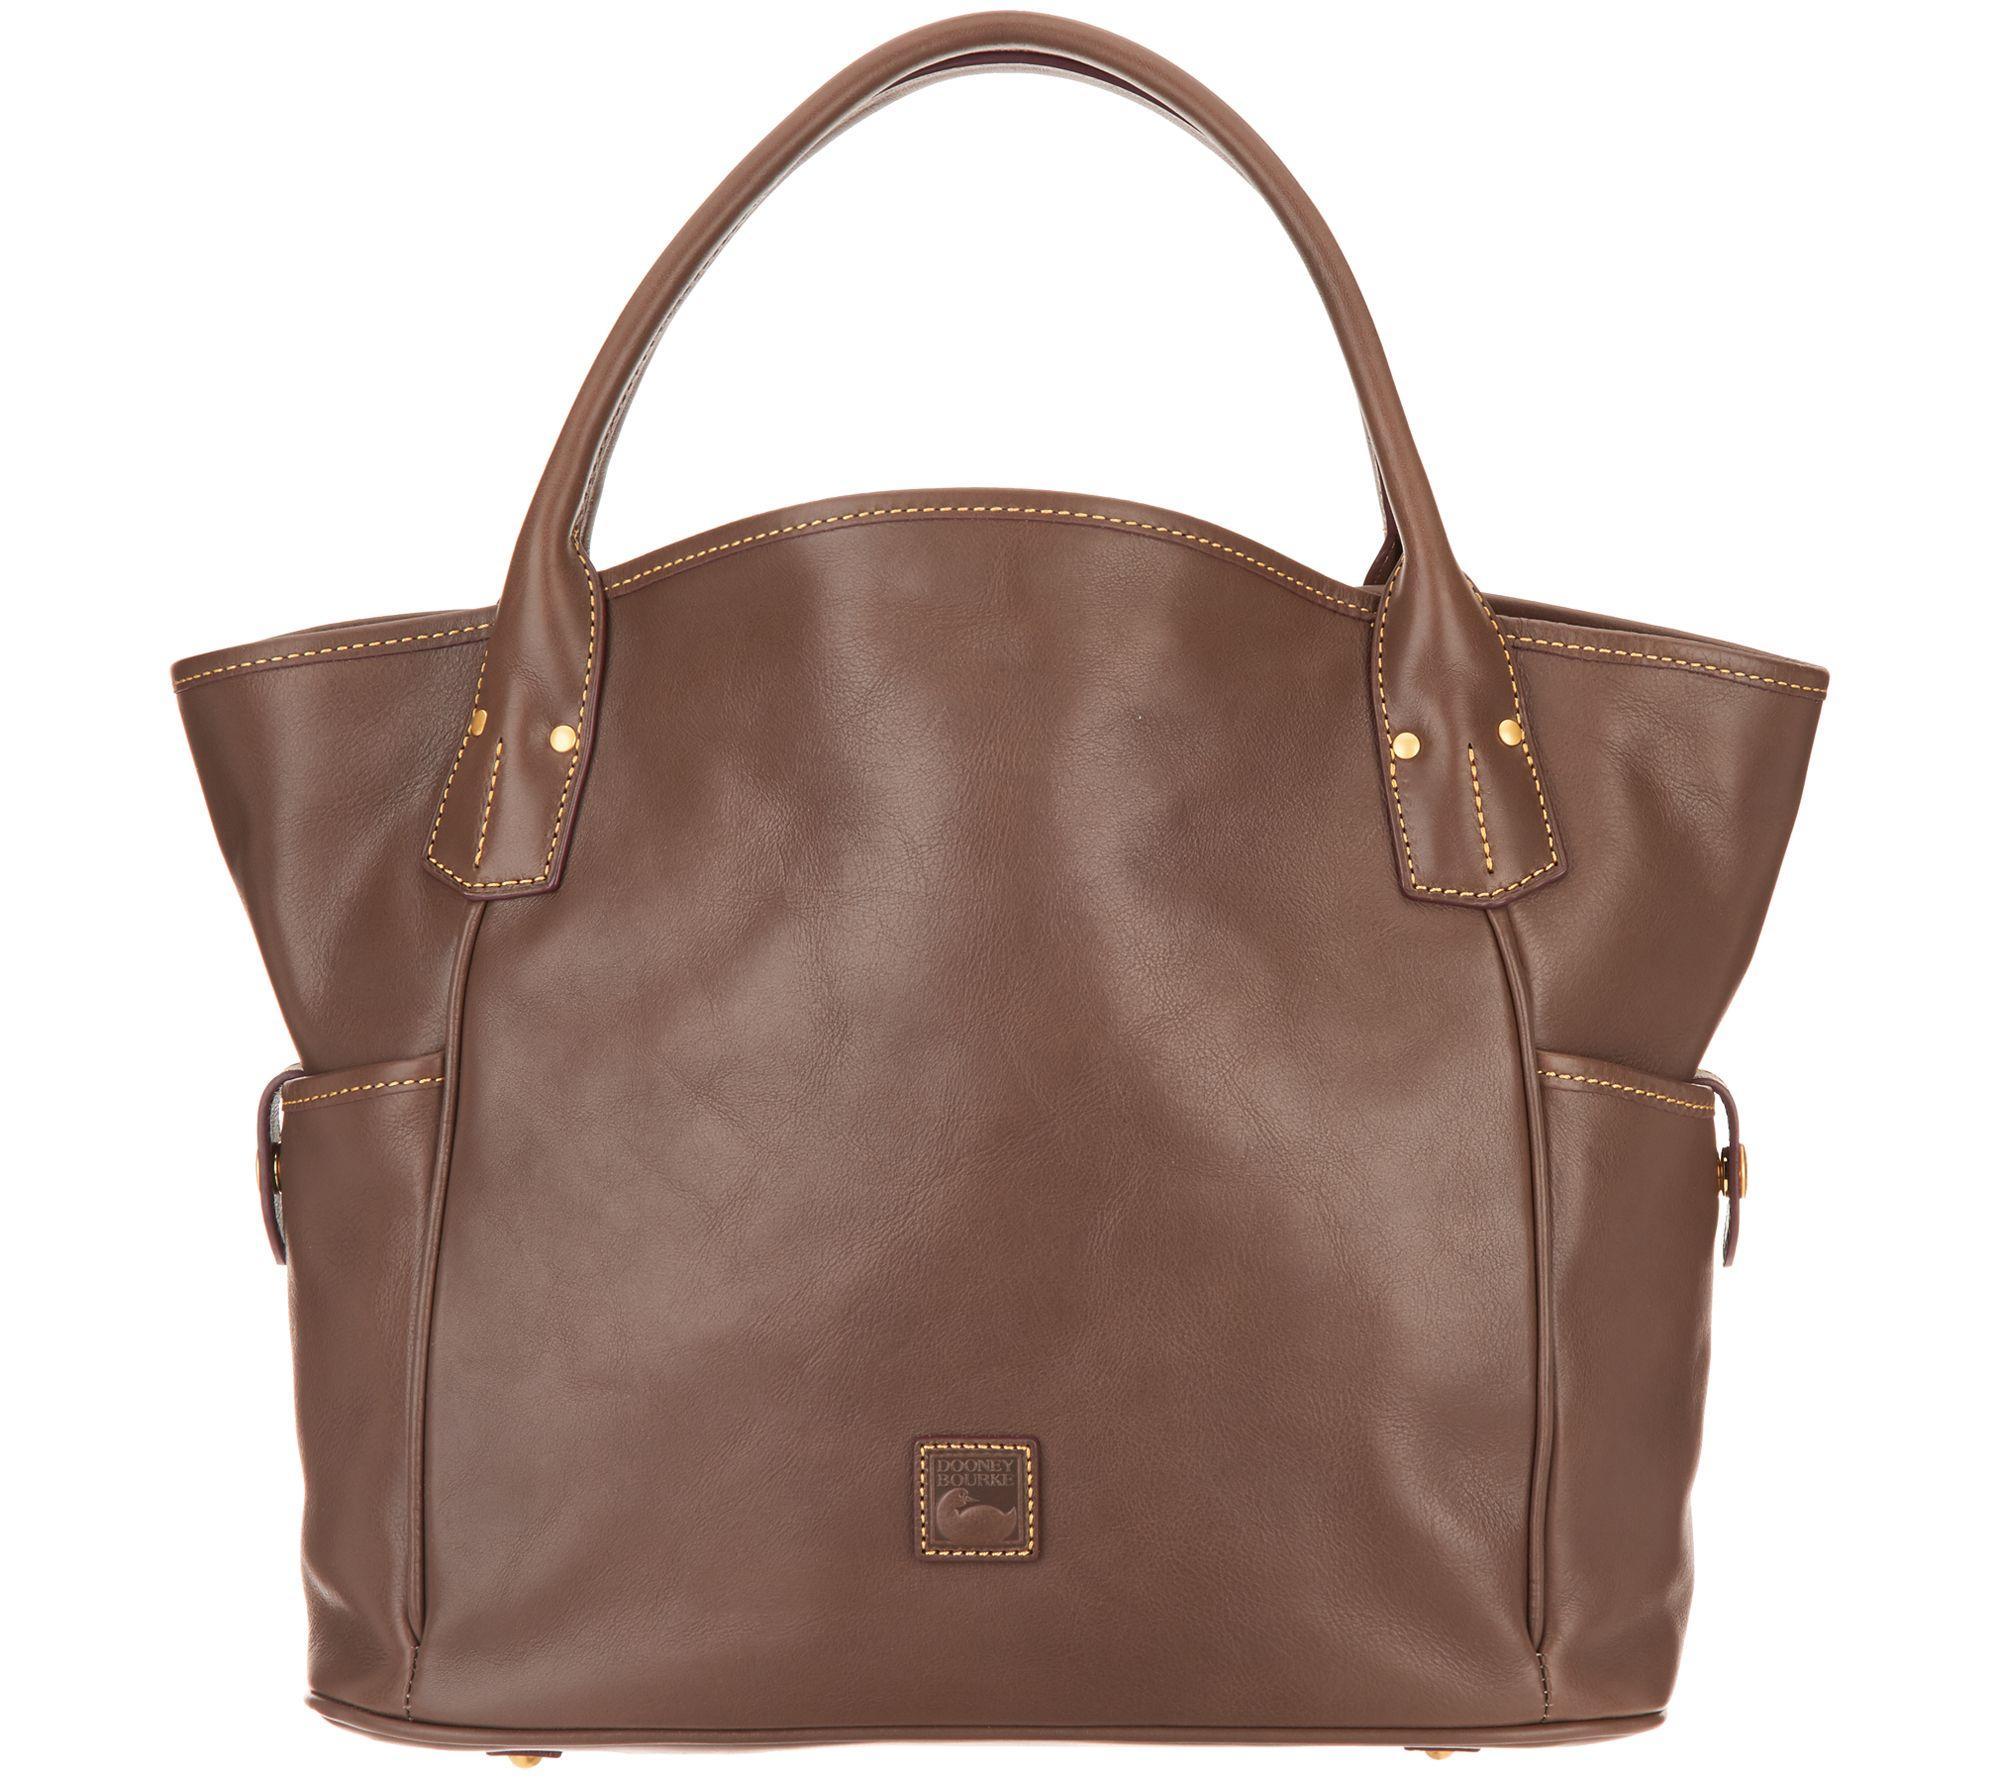 69e0977854 Dooney & Bourke Florentine Leather Kristen Tote - Page 1 — QVC.com